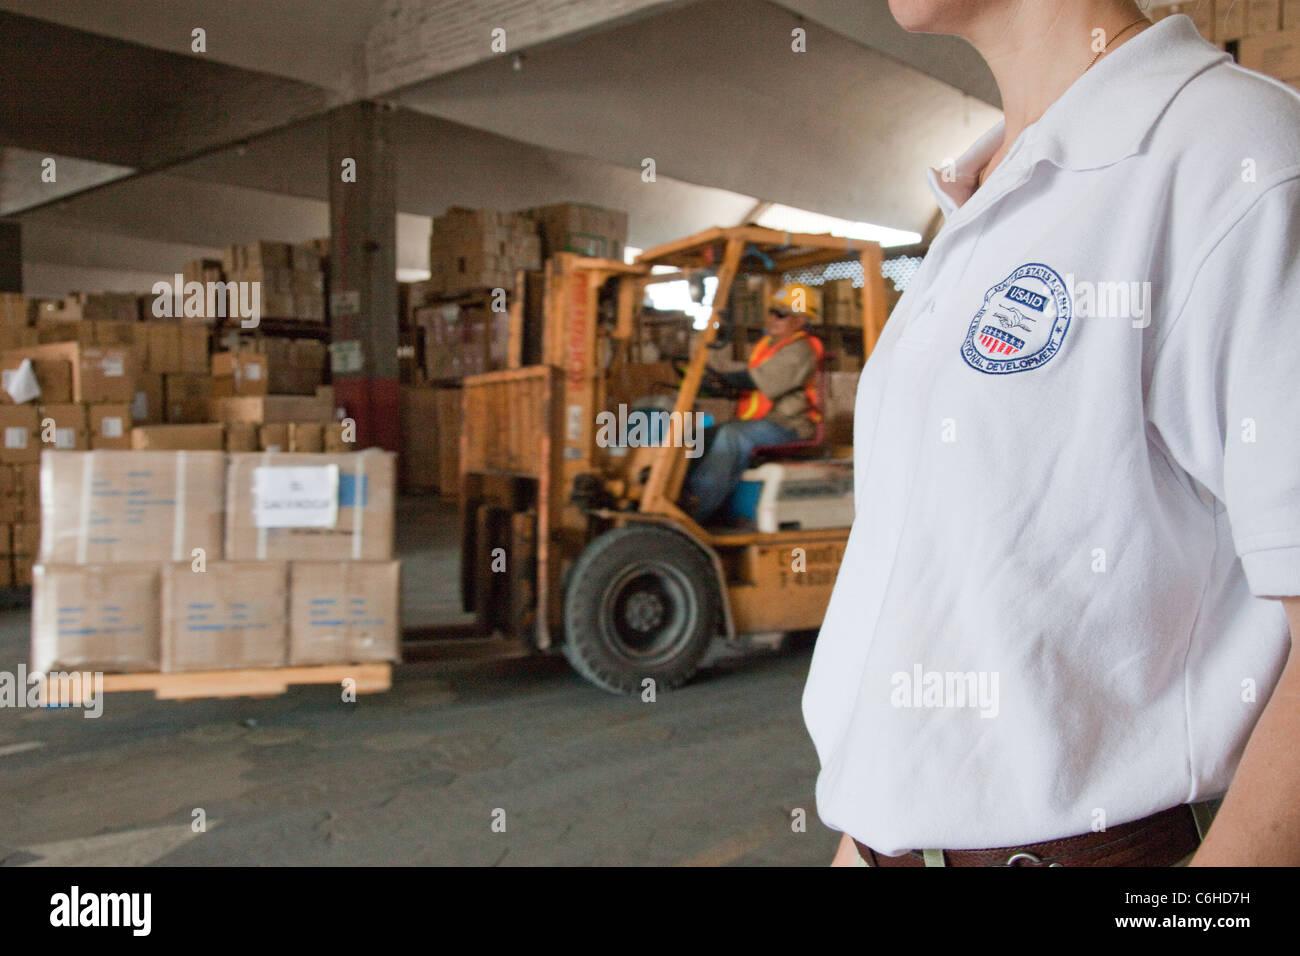 USAID distribution at the port in San Salvador, El Salvador Stock Photo